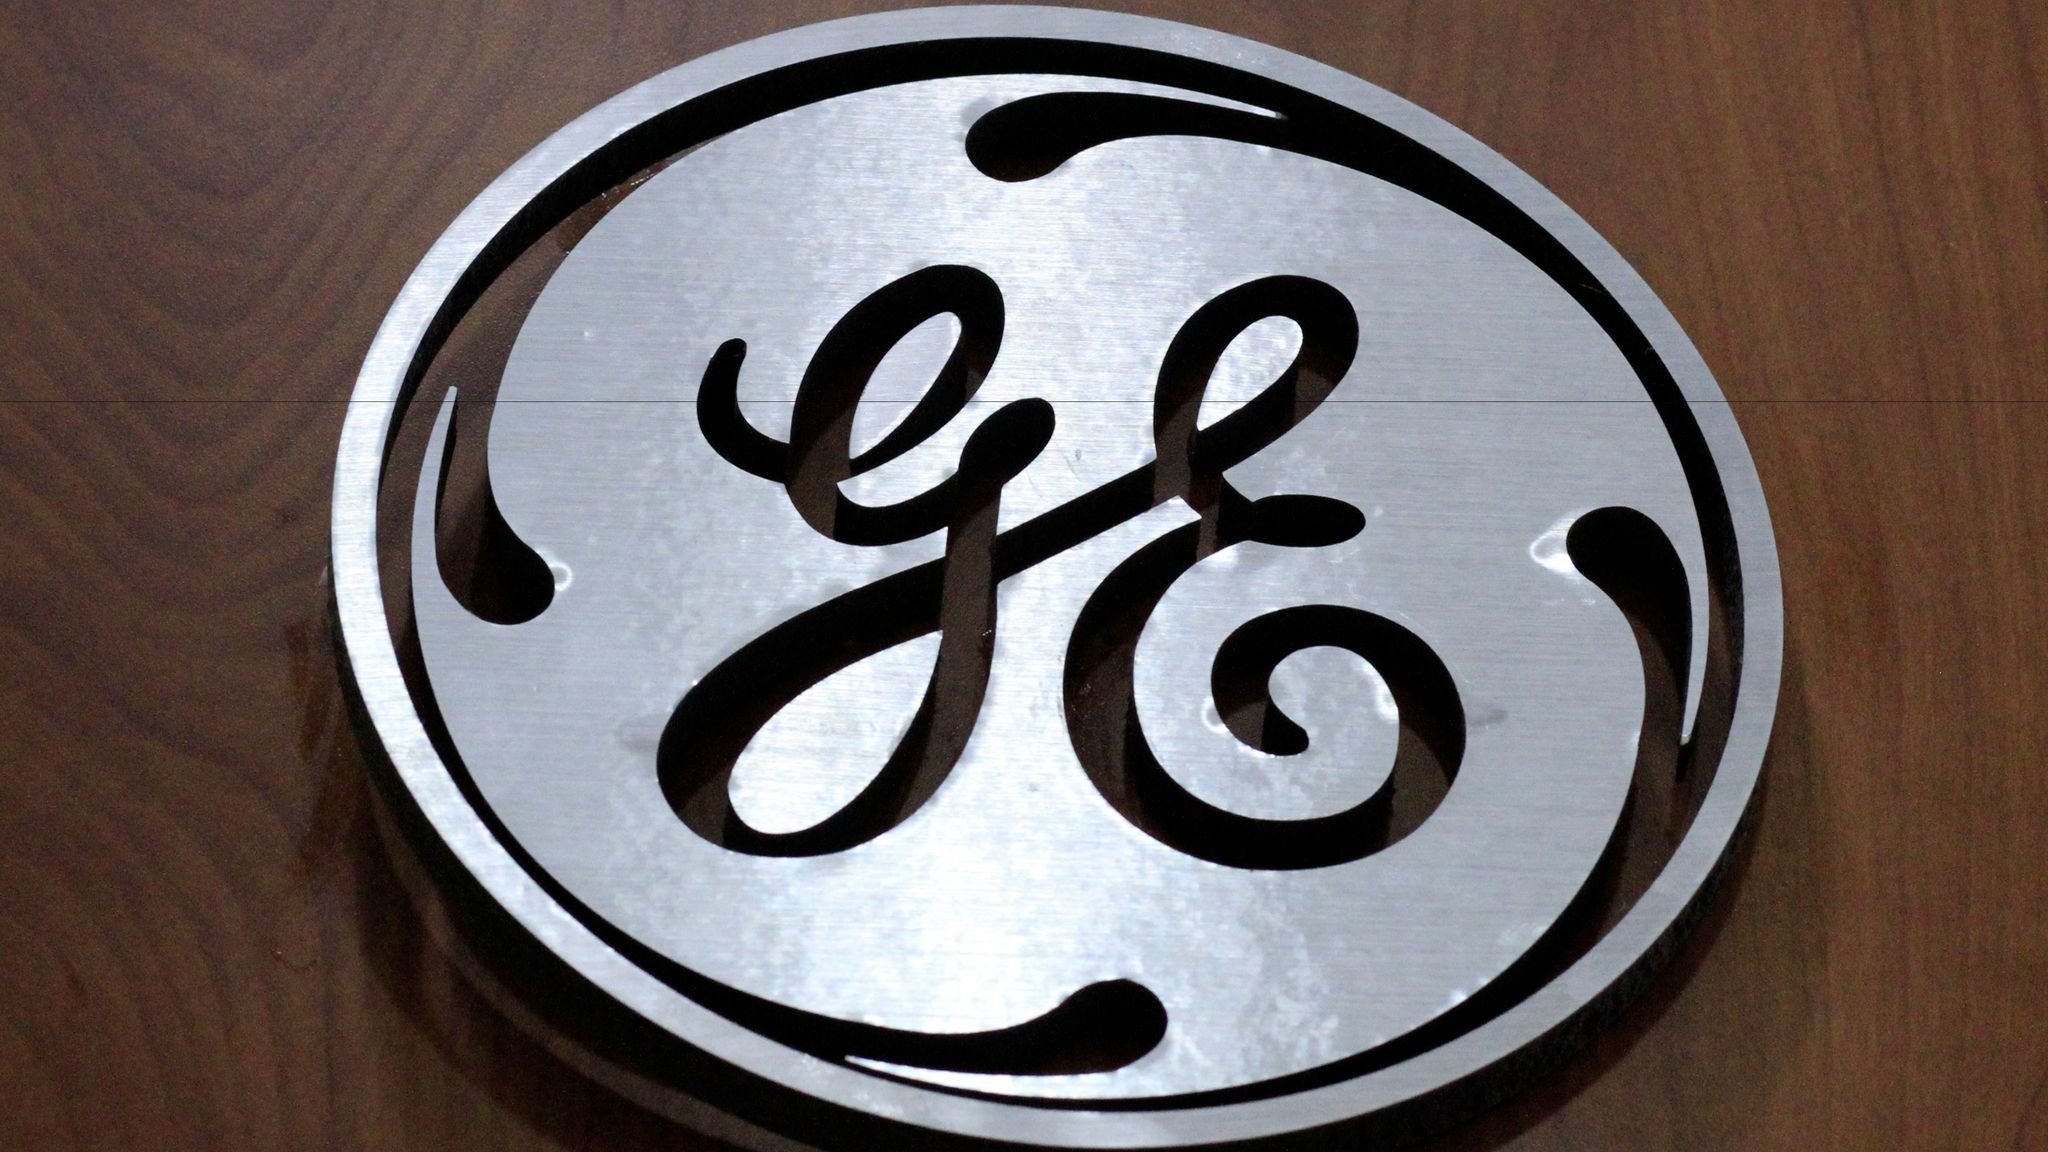 GE misses revenue estimates weighed down by slump in oil market